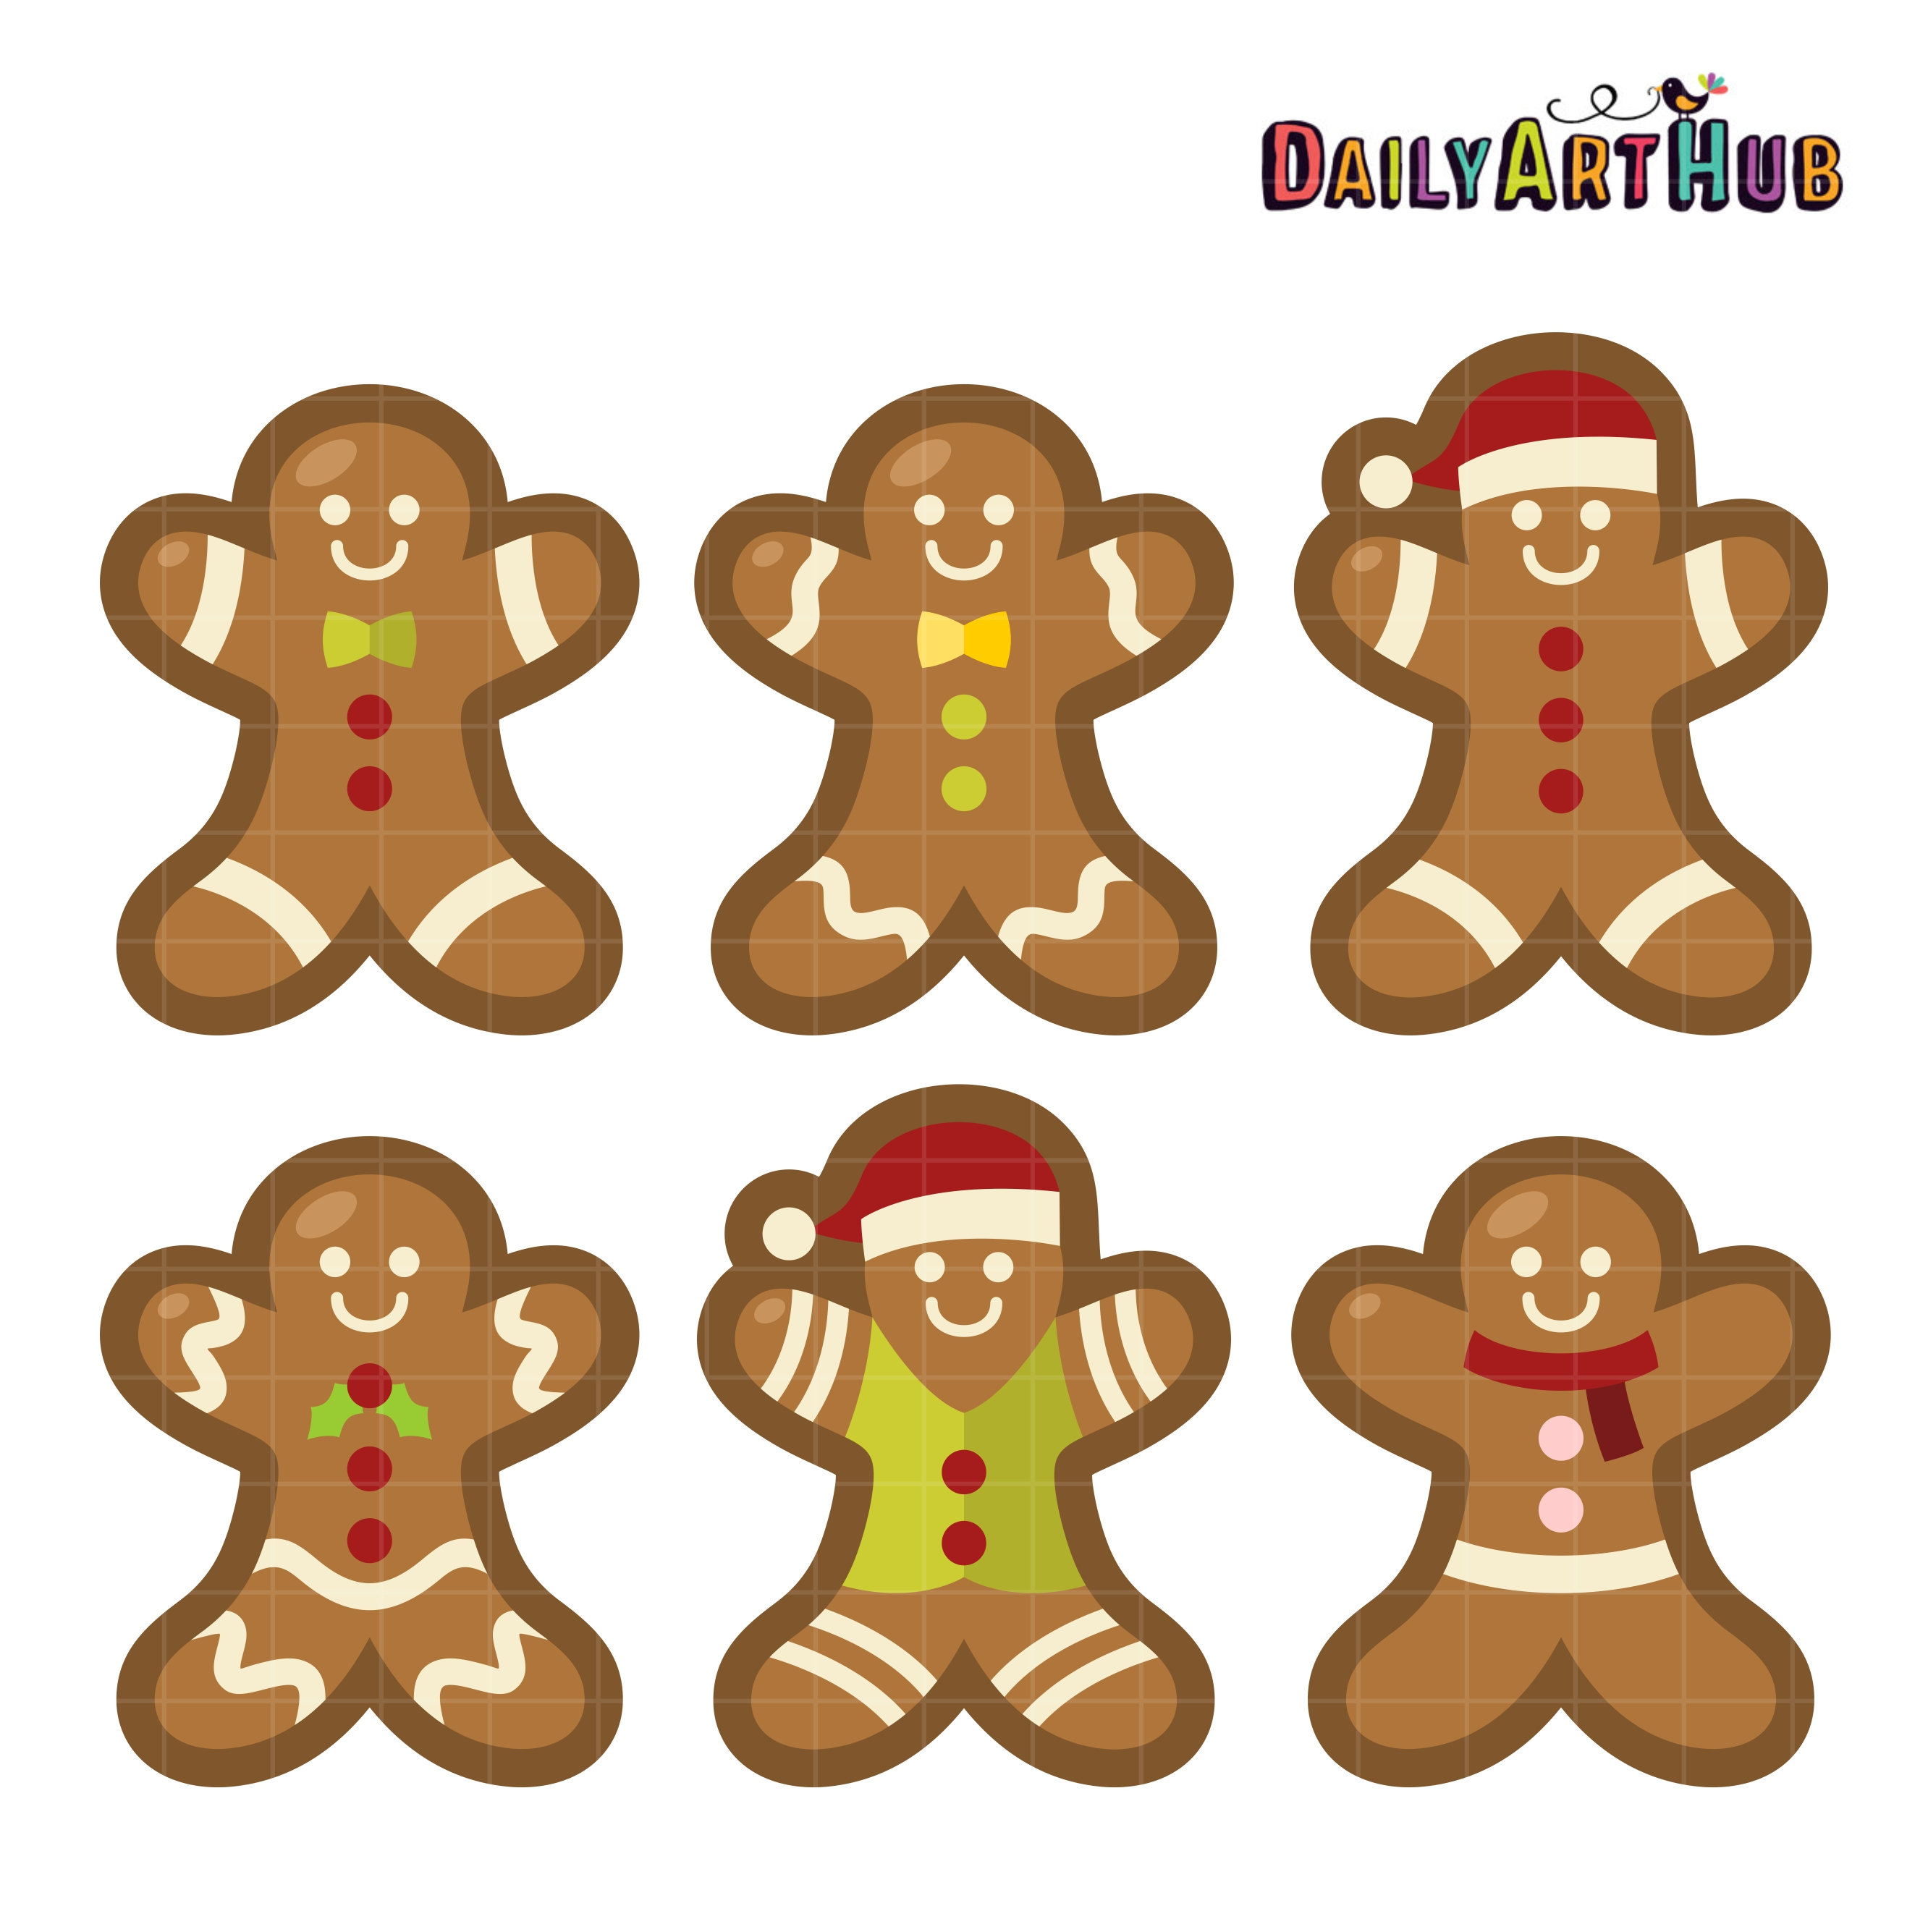 yummy gingerbread man clip art set daily art hub free clip art rh dailyarthub com gingerbread man border clipart gingerbread man clip art free